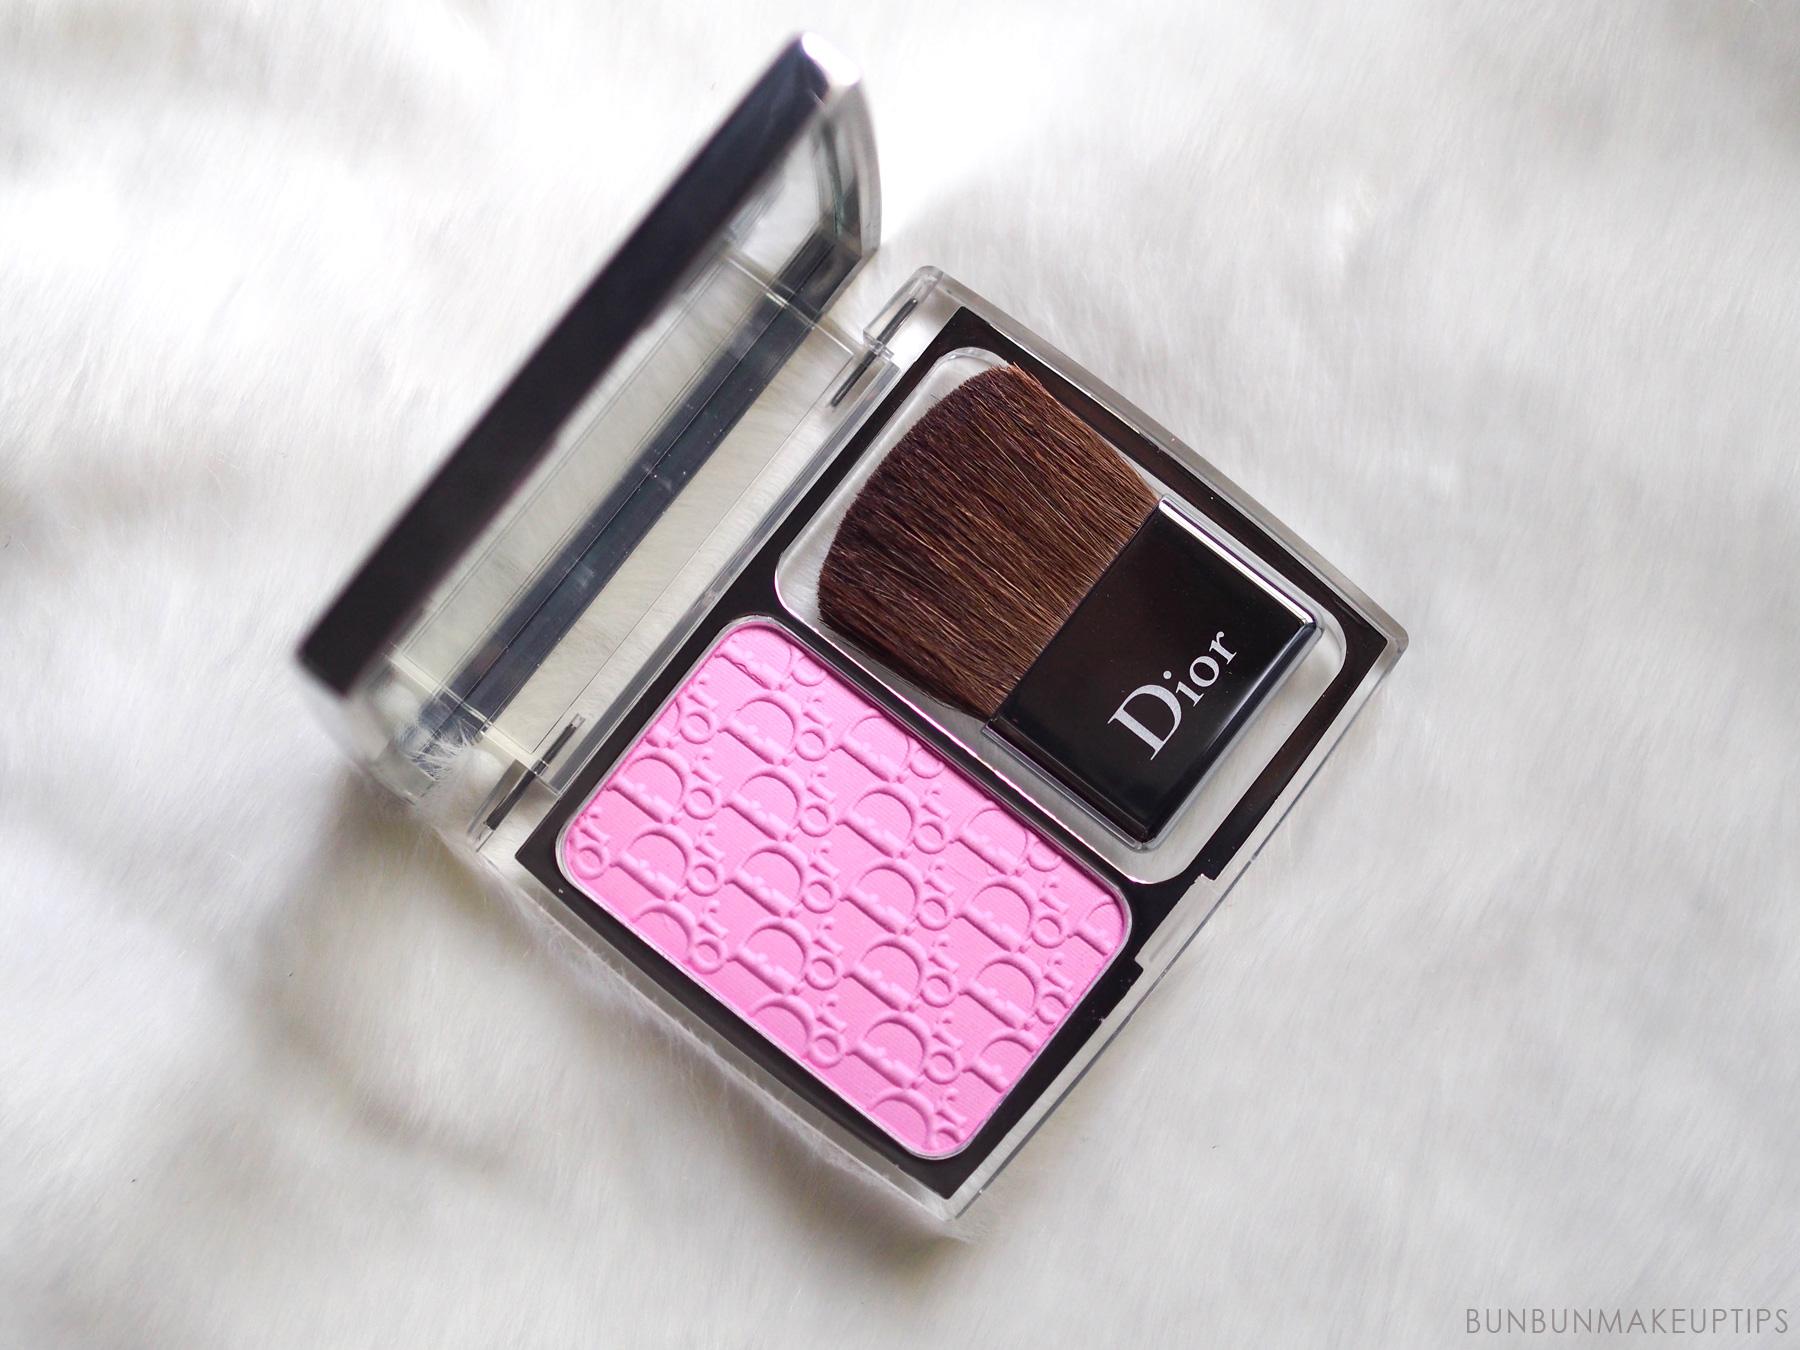 Dior-Rosy-Glow-Healthy-Glow-Awakening-Blush-Review_4